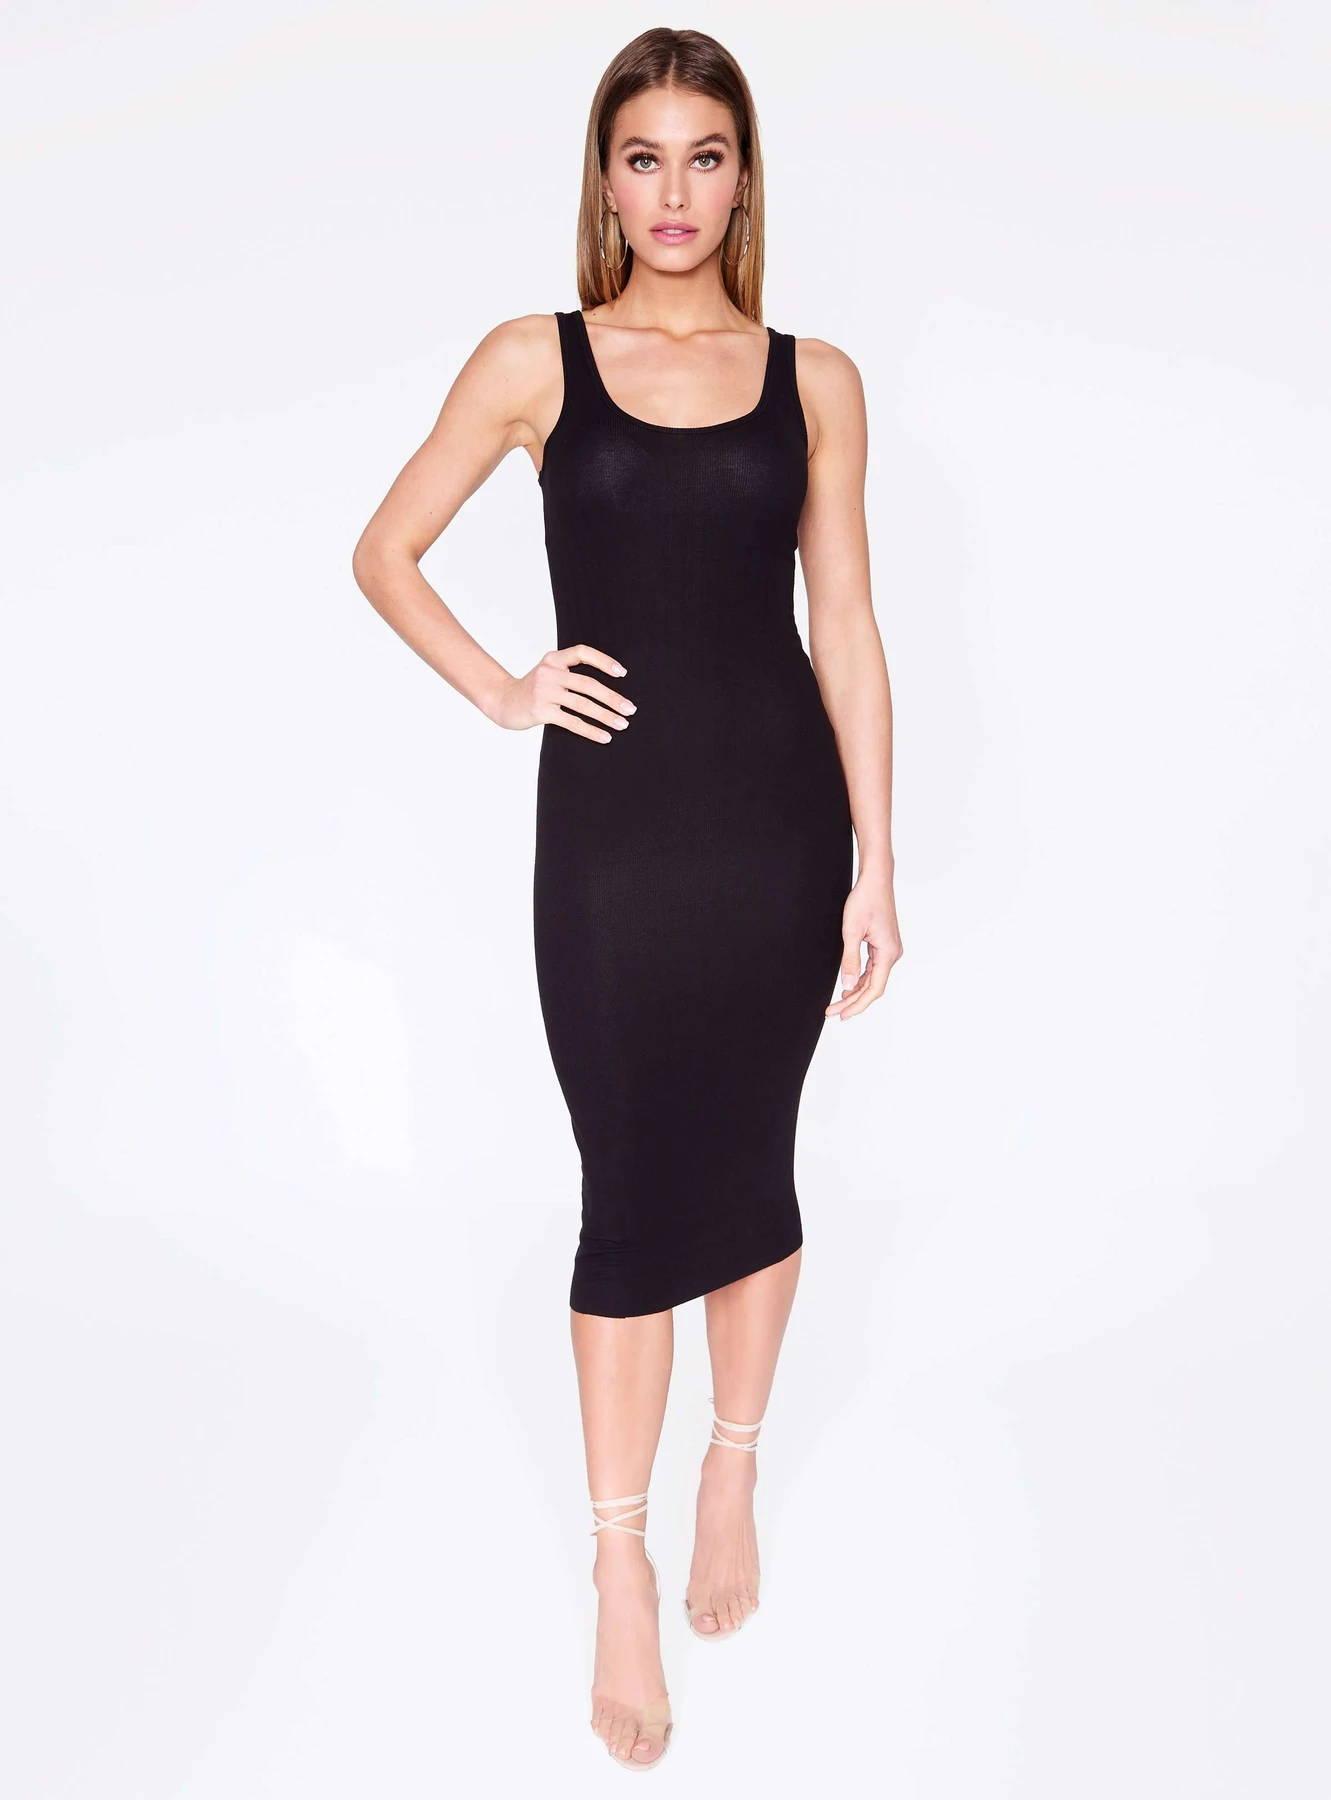 HeyYou Basic Black Ribbed Tank Dress